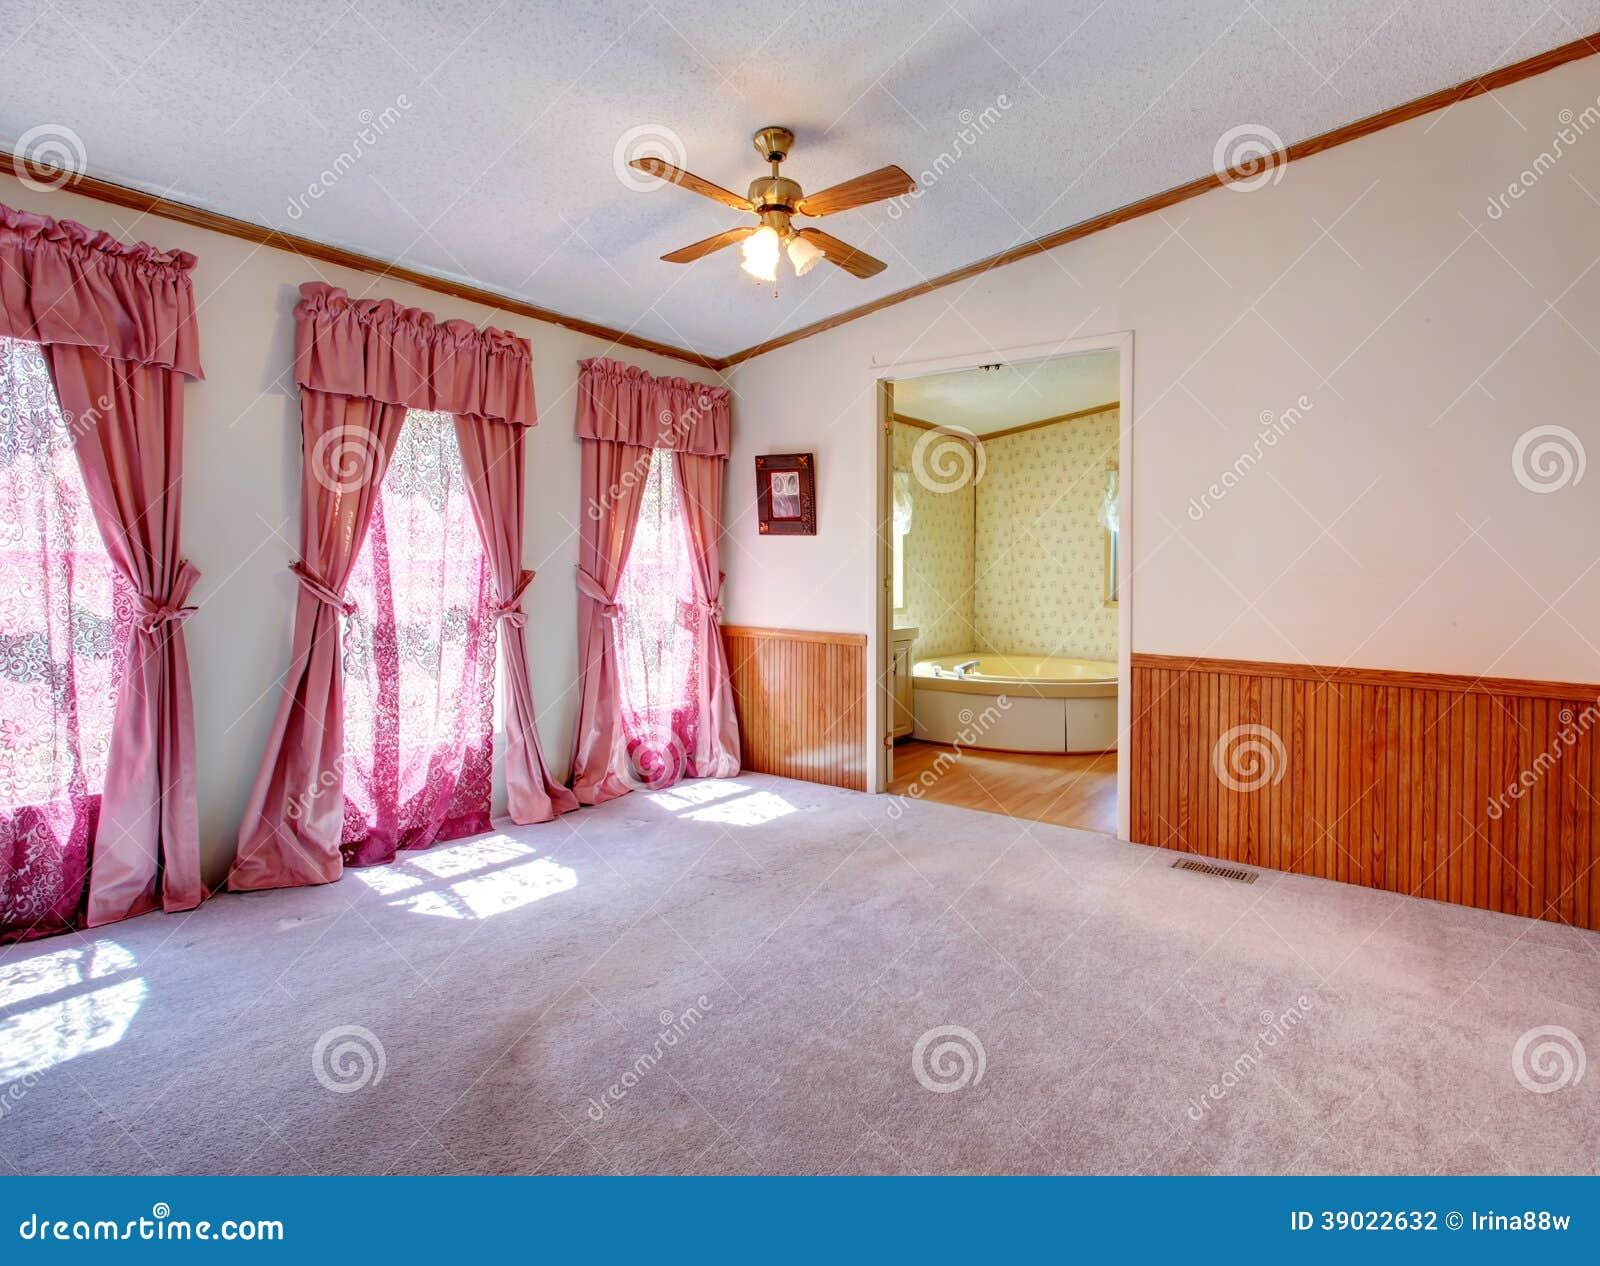 Empty bedroom with nice window treatment stock photo for Empty master bathroom